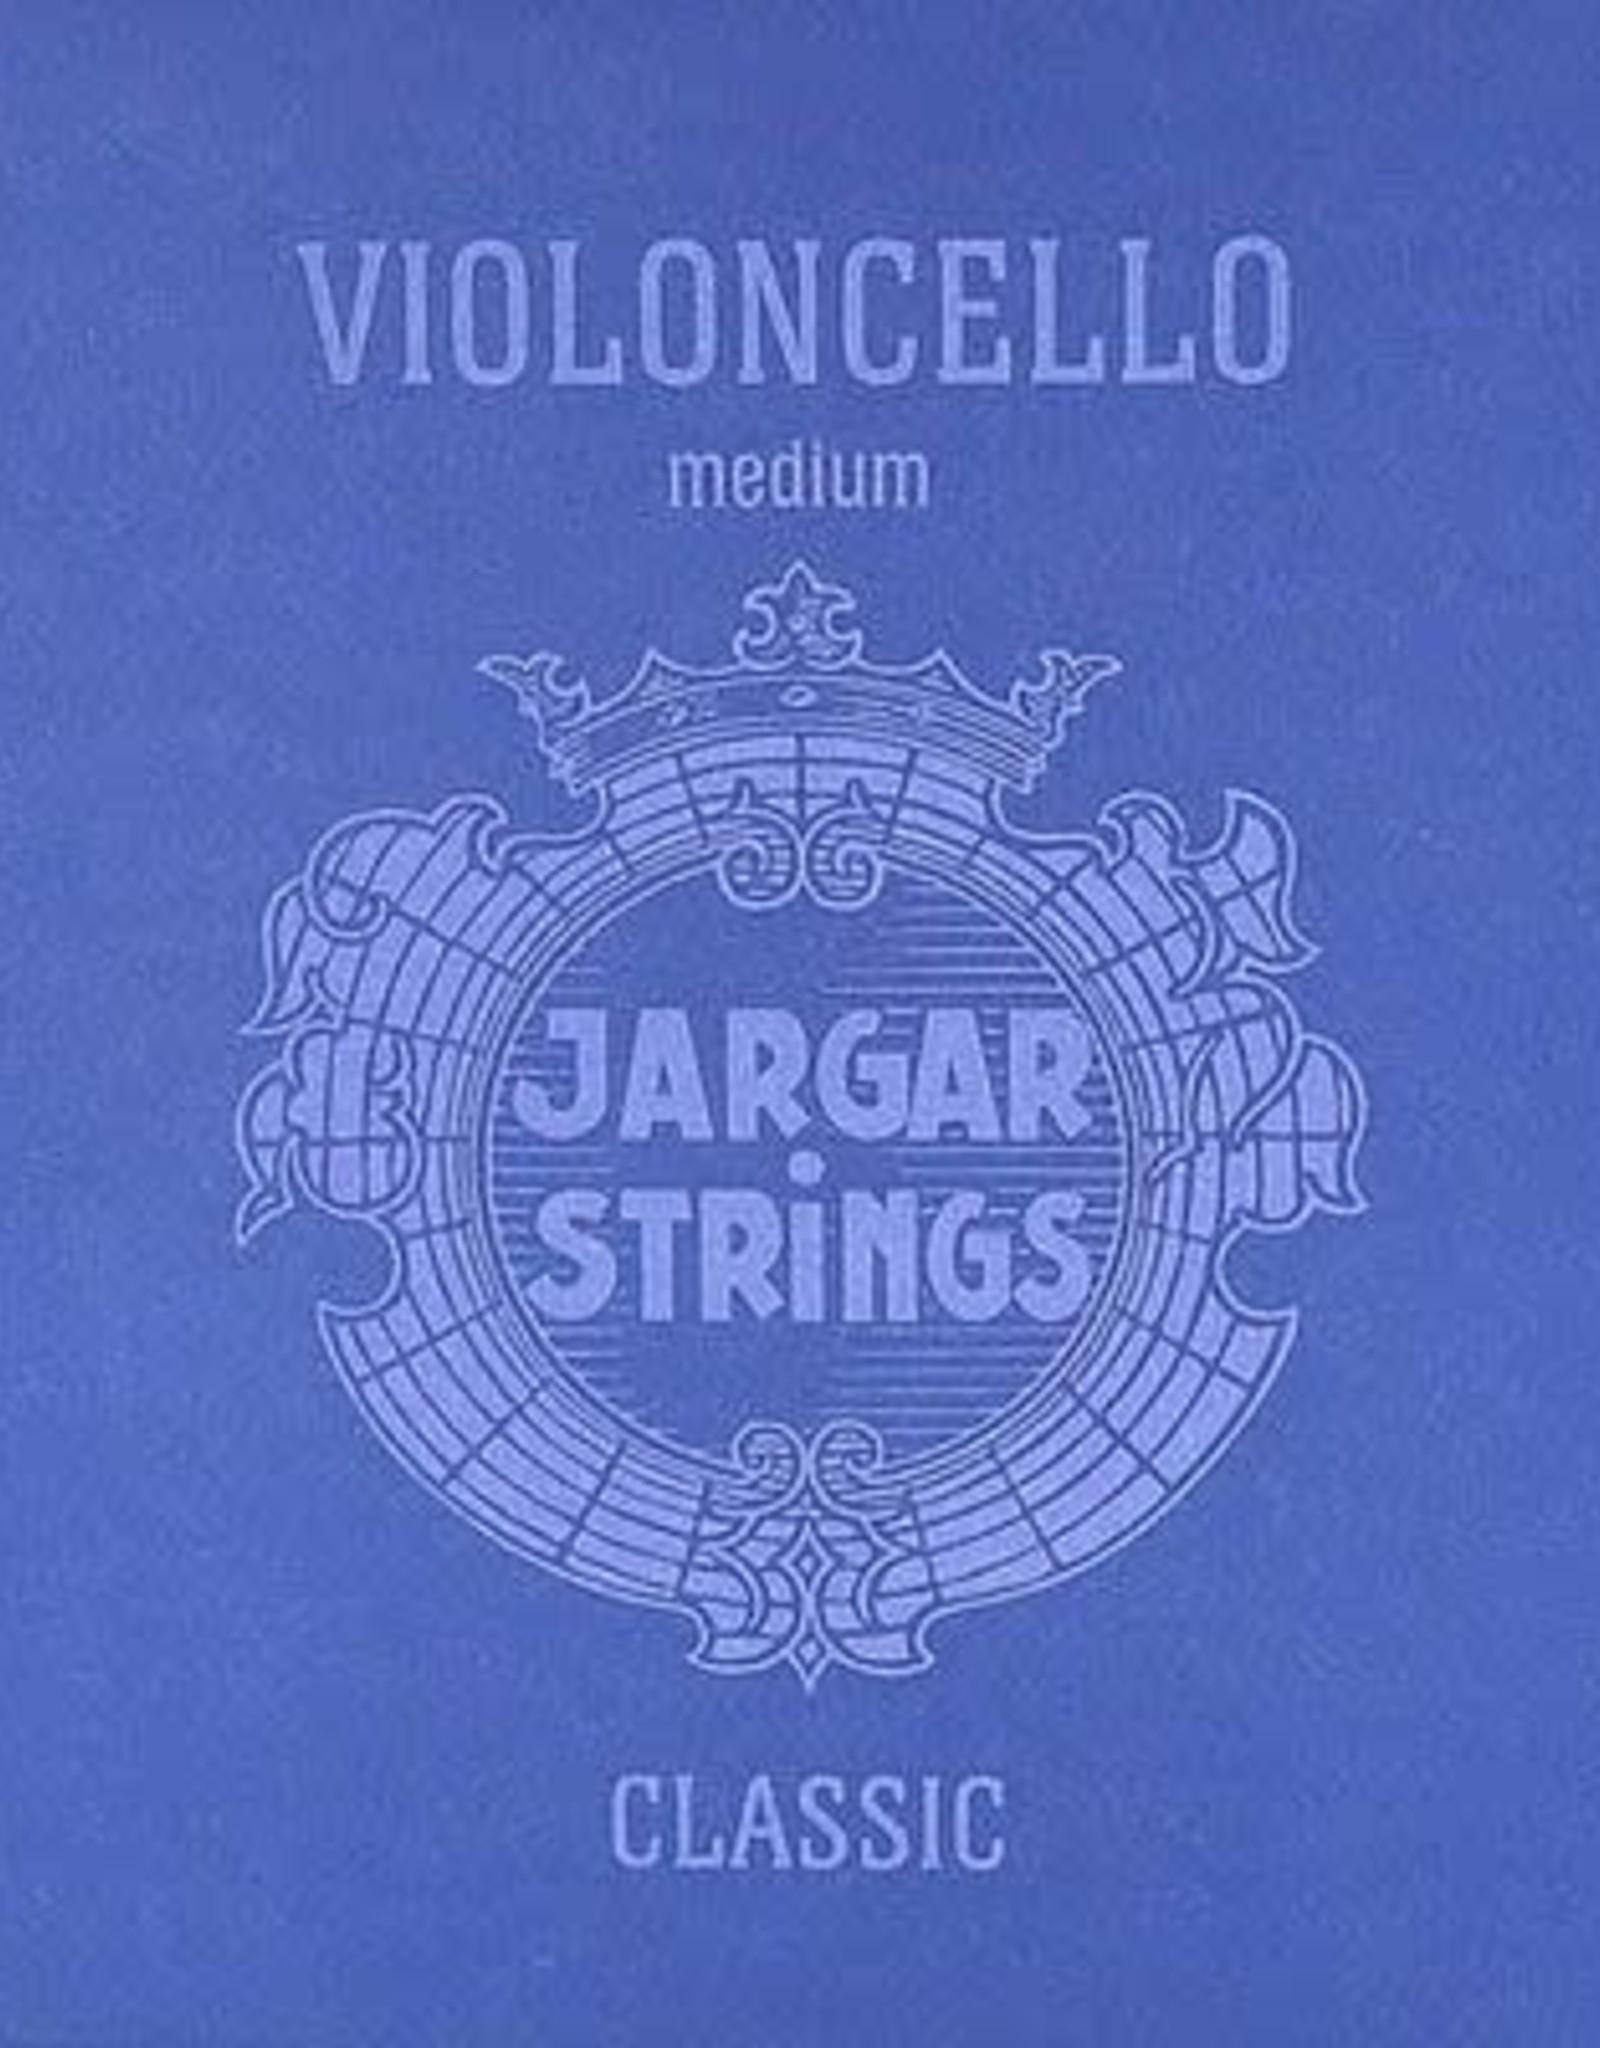 JARGAR snarenset cello, medium, flexi-metal, 4/4